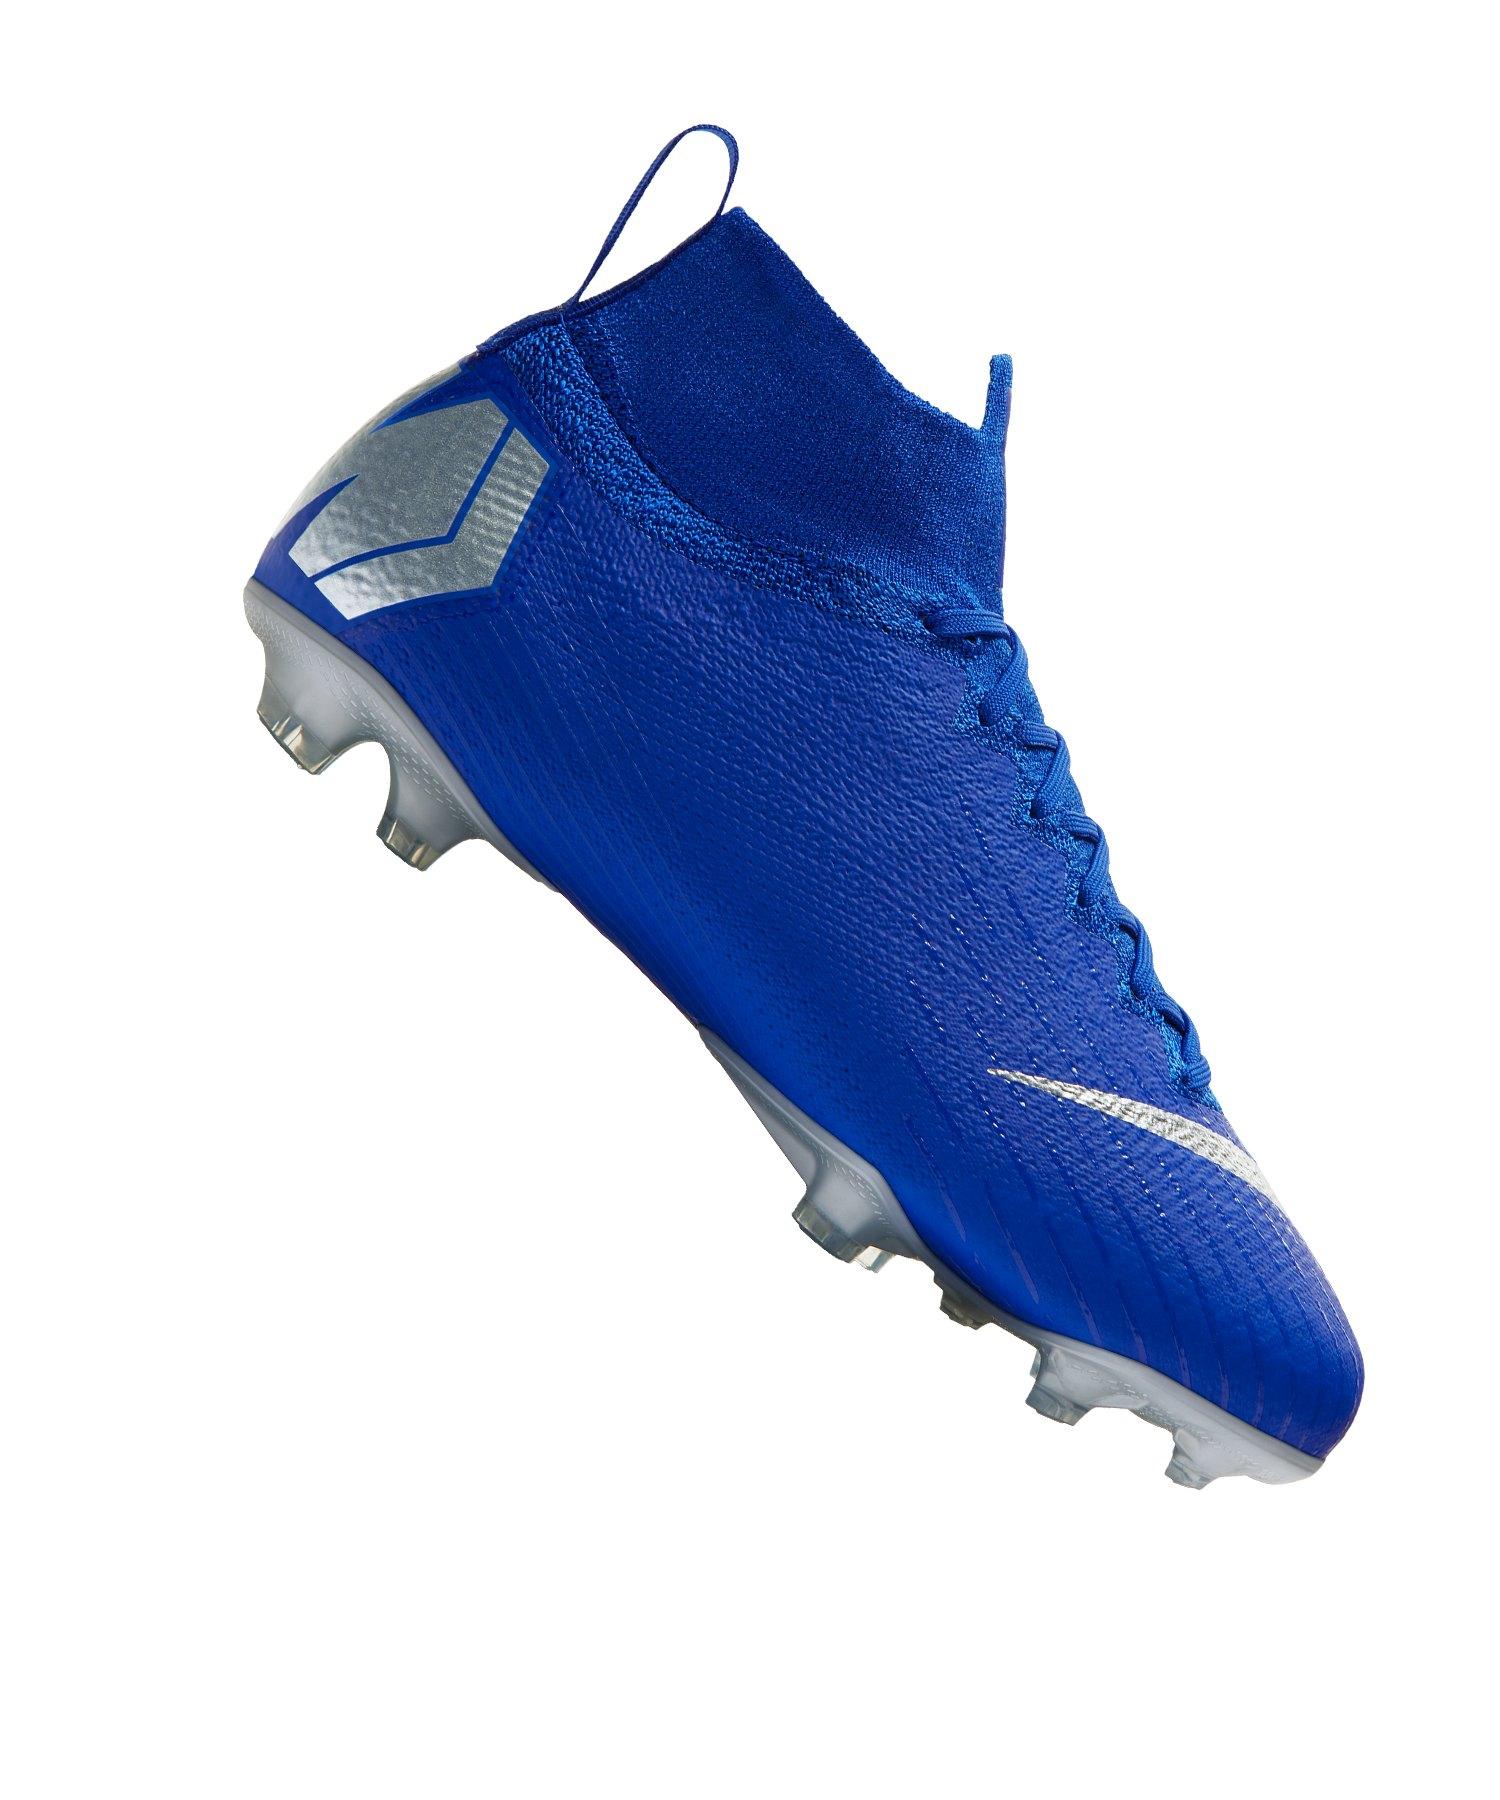 Kinder Fussballschuhe Nike Mercurial Superfly Vi Elite Fg